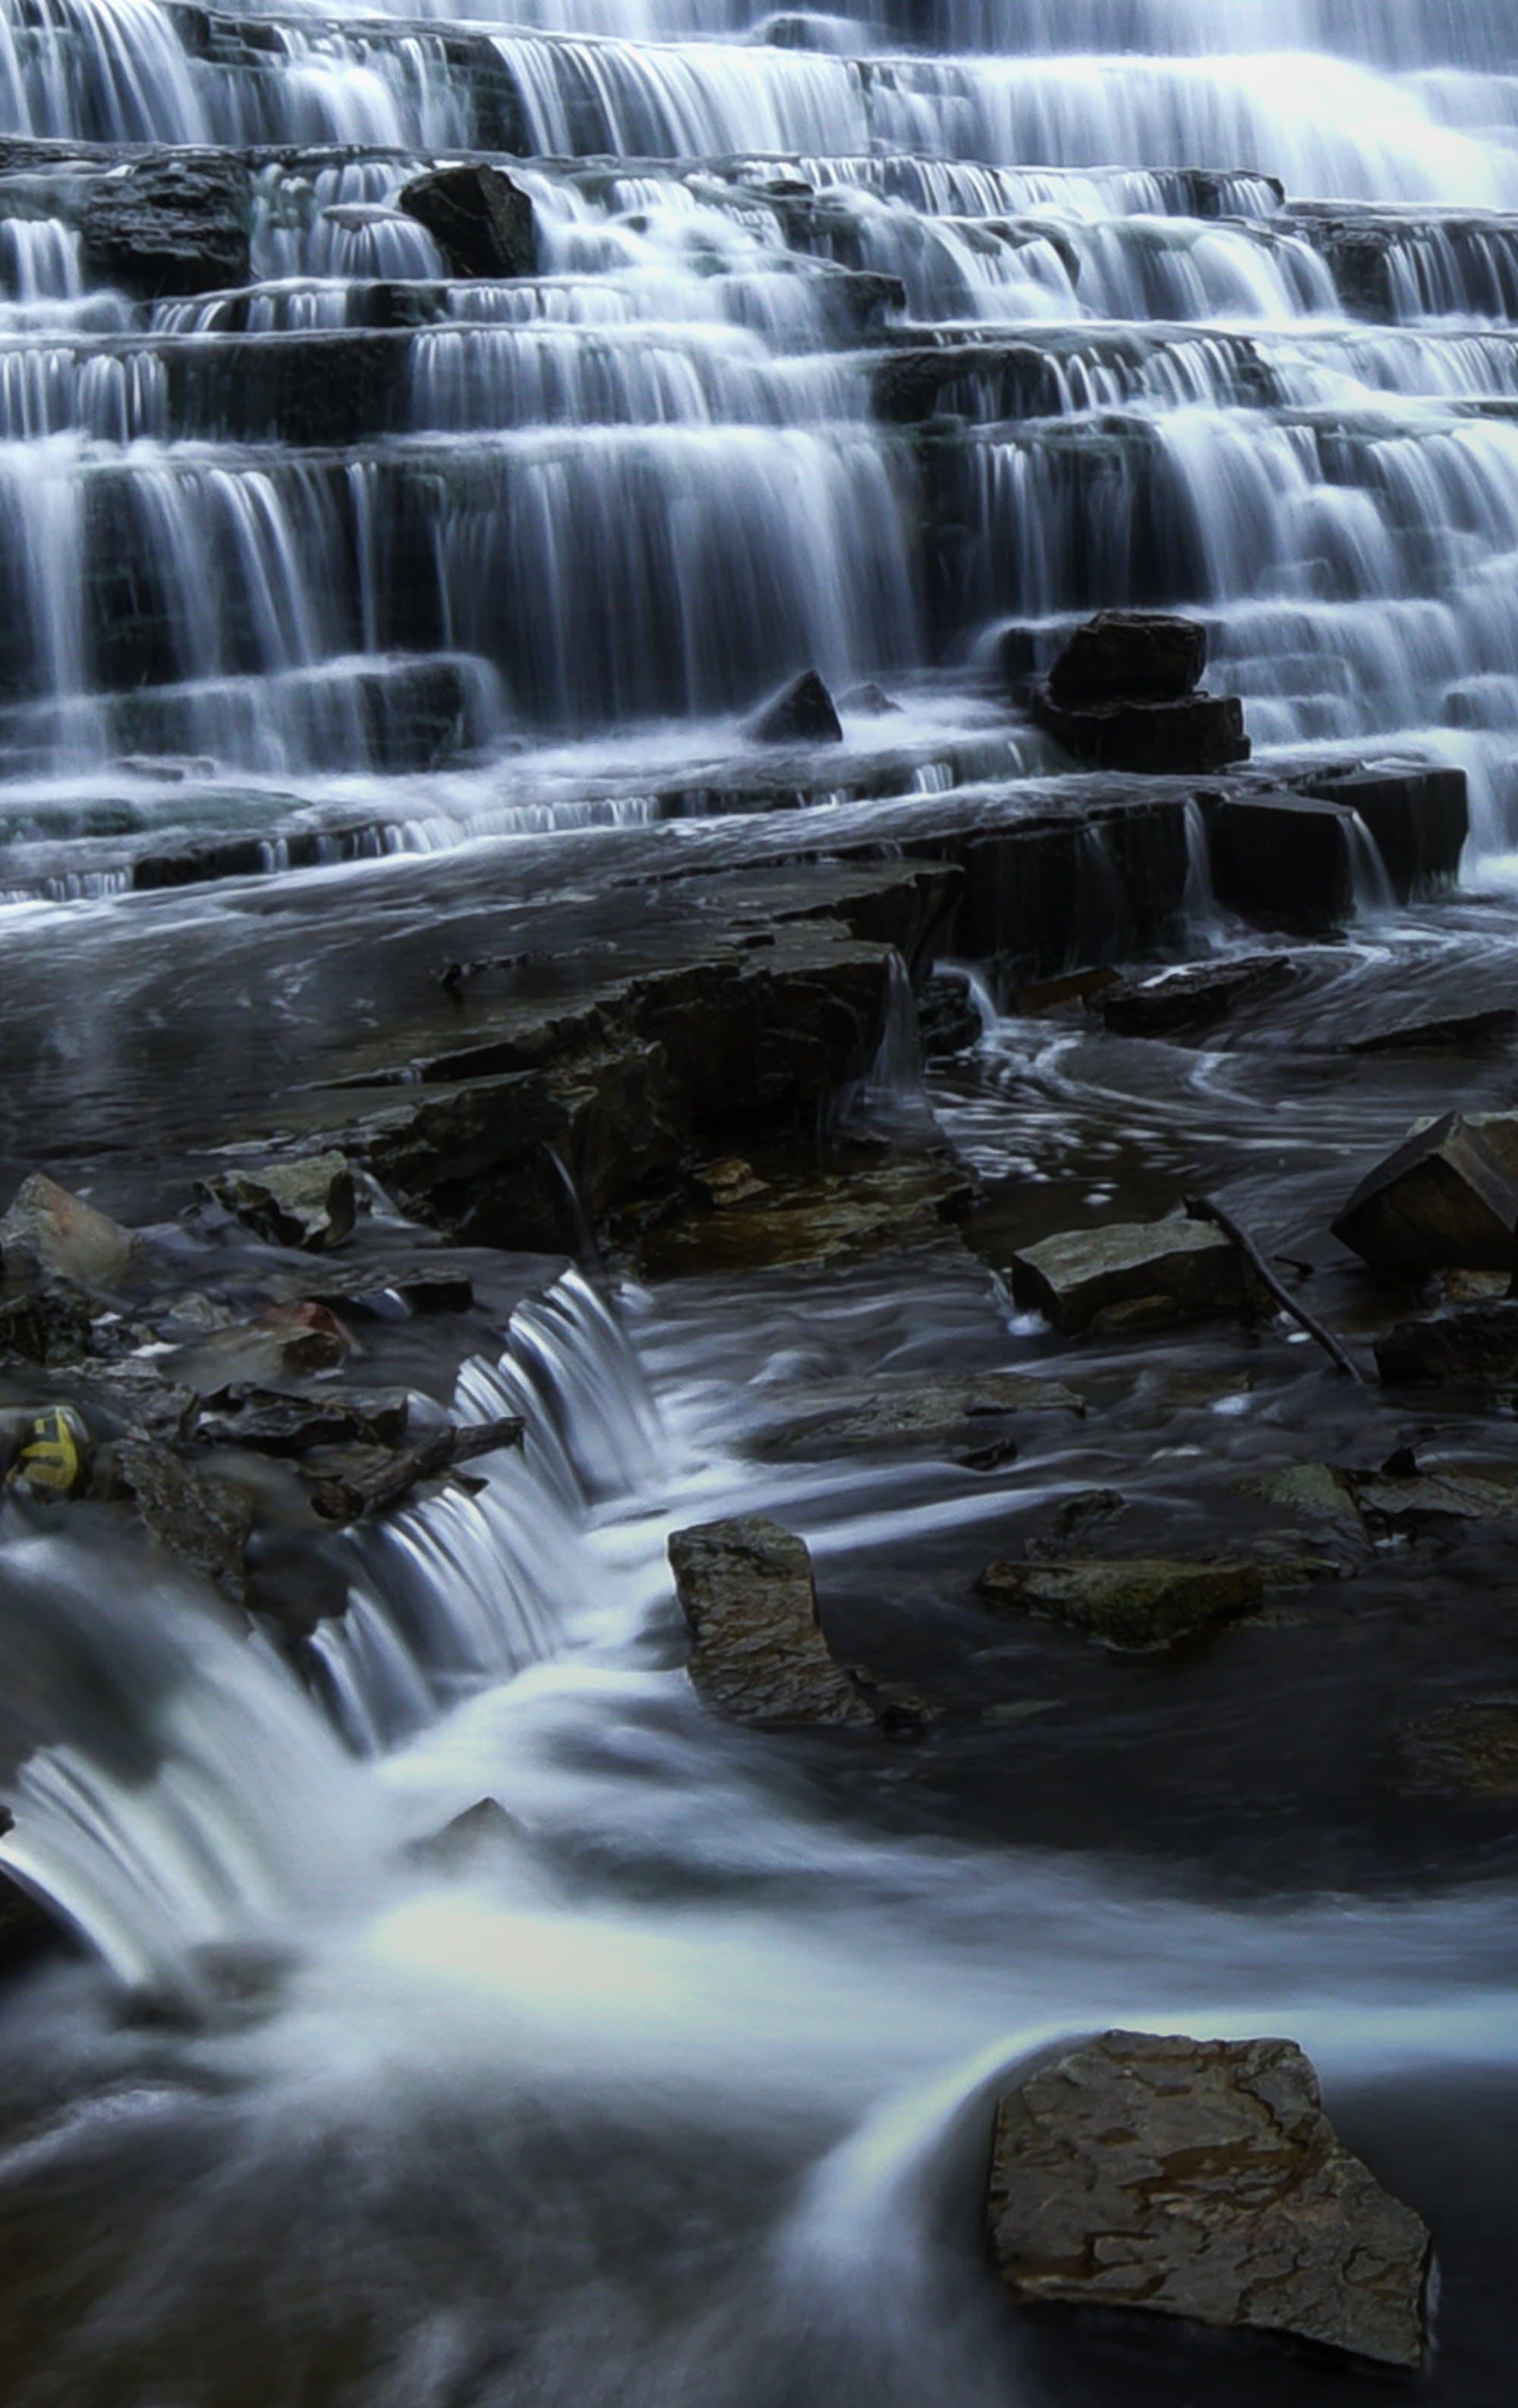 Free stock photo of landscape, nature, water, rocks